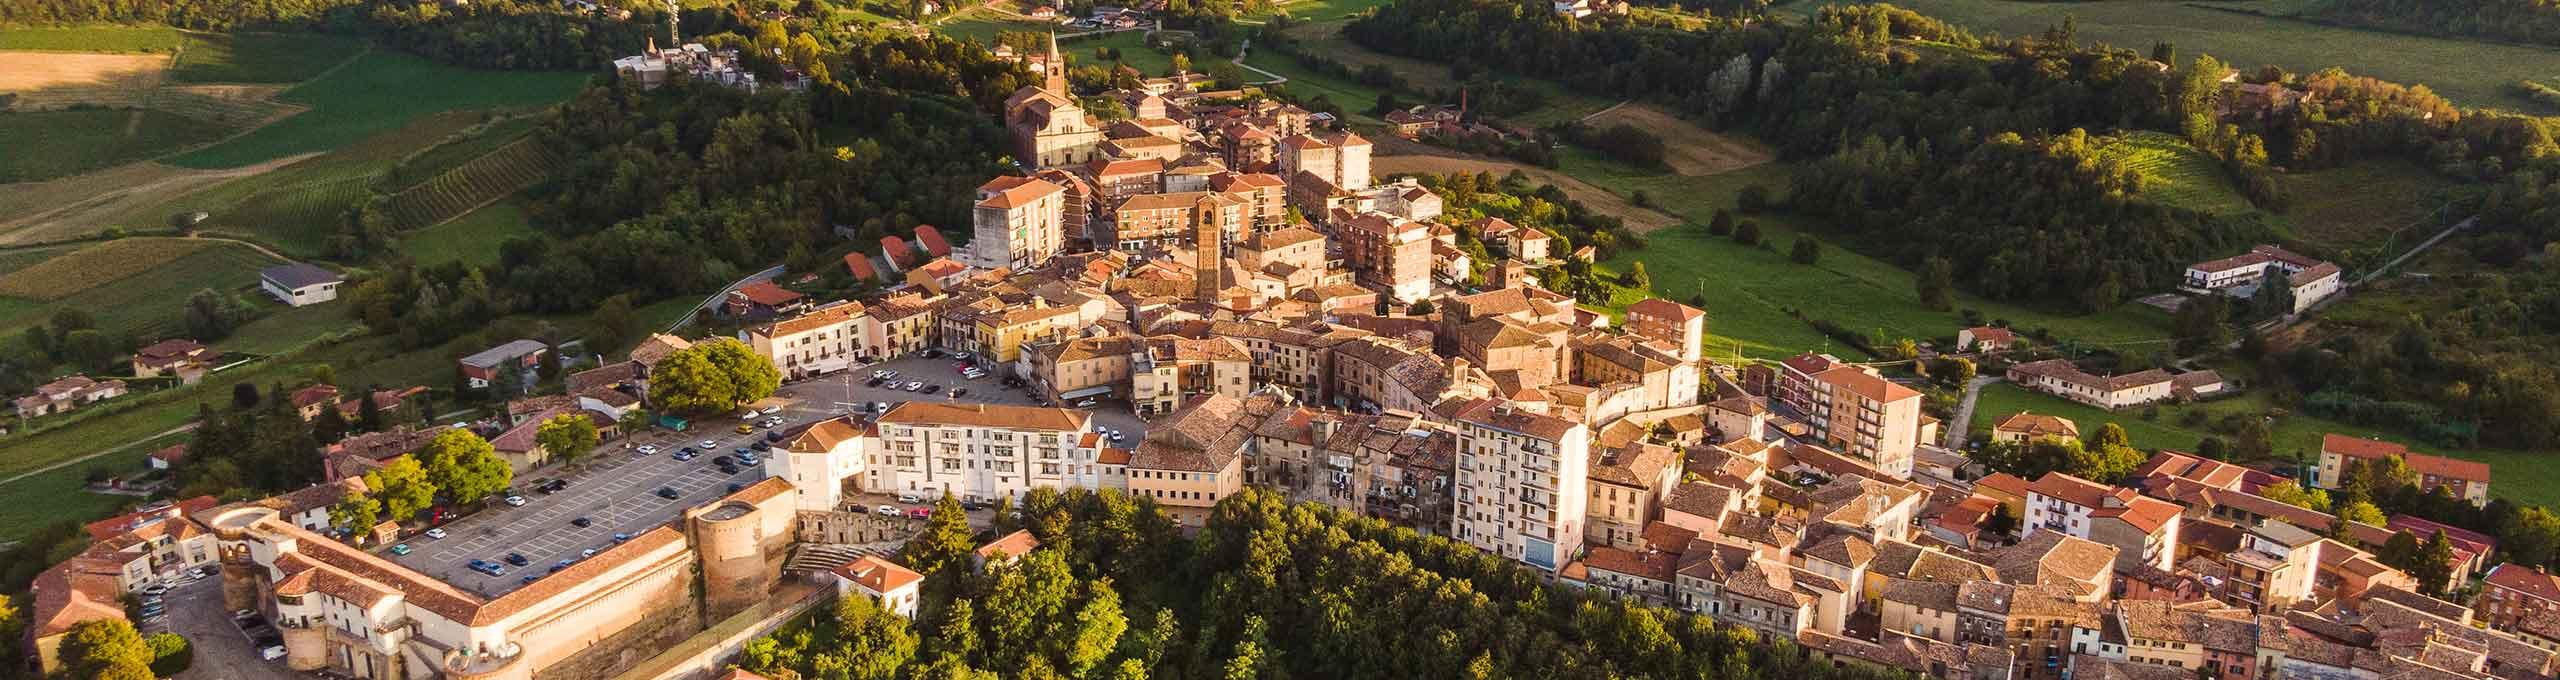 Moncalvo, Monferrato Astigiano